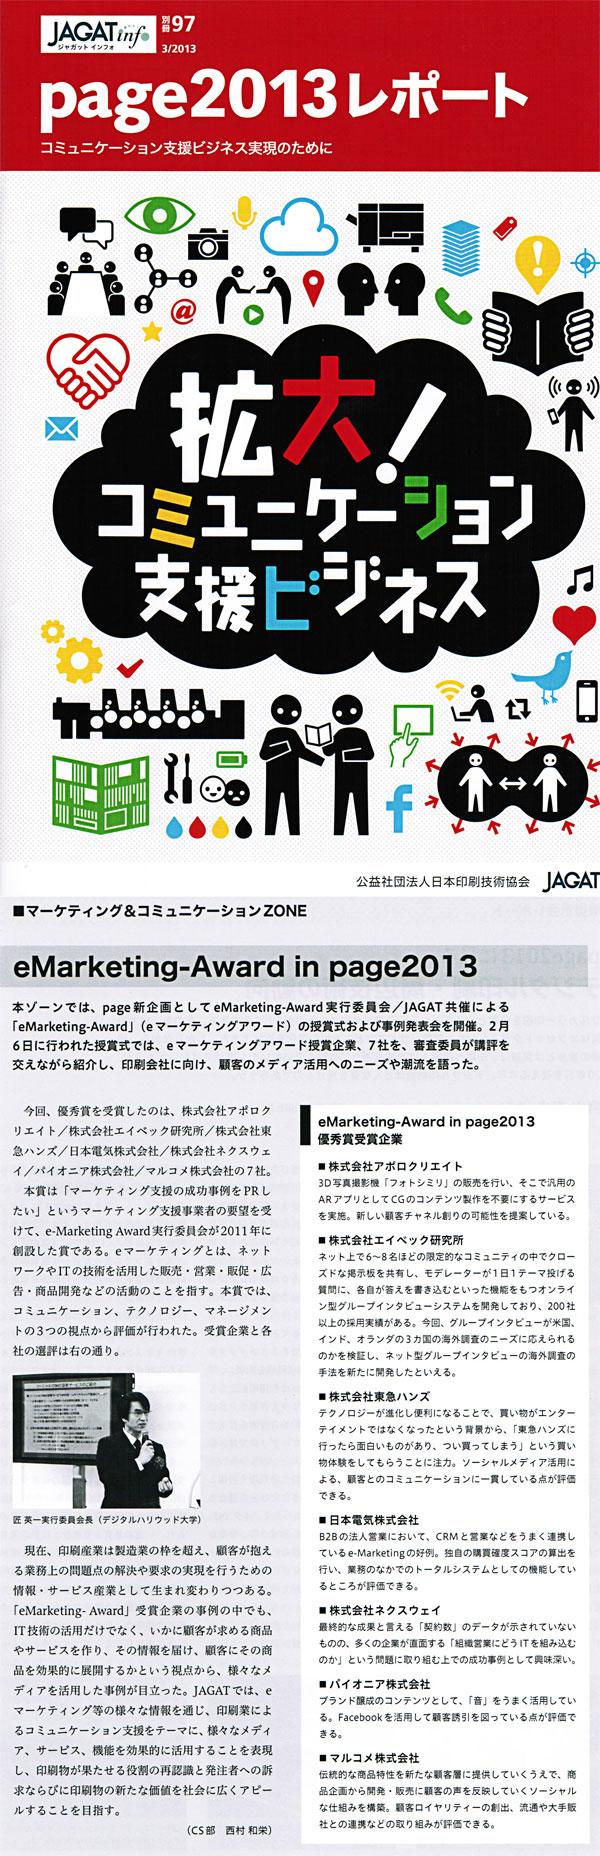 page2013レポートに掲載されました。